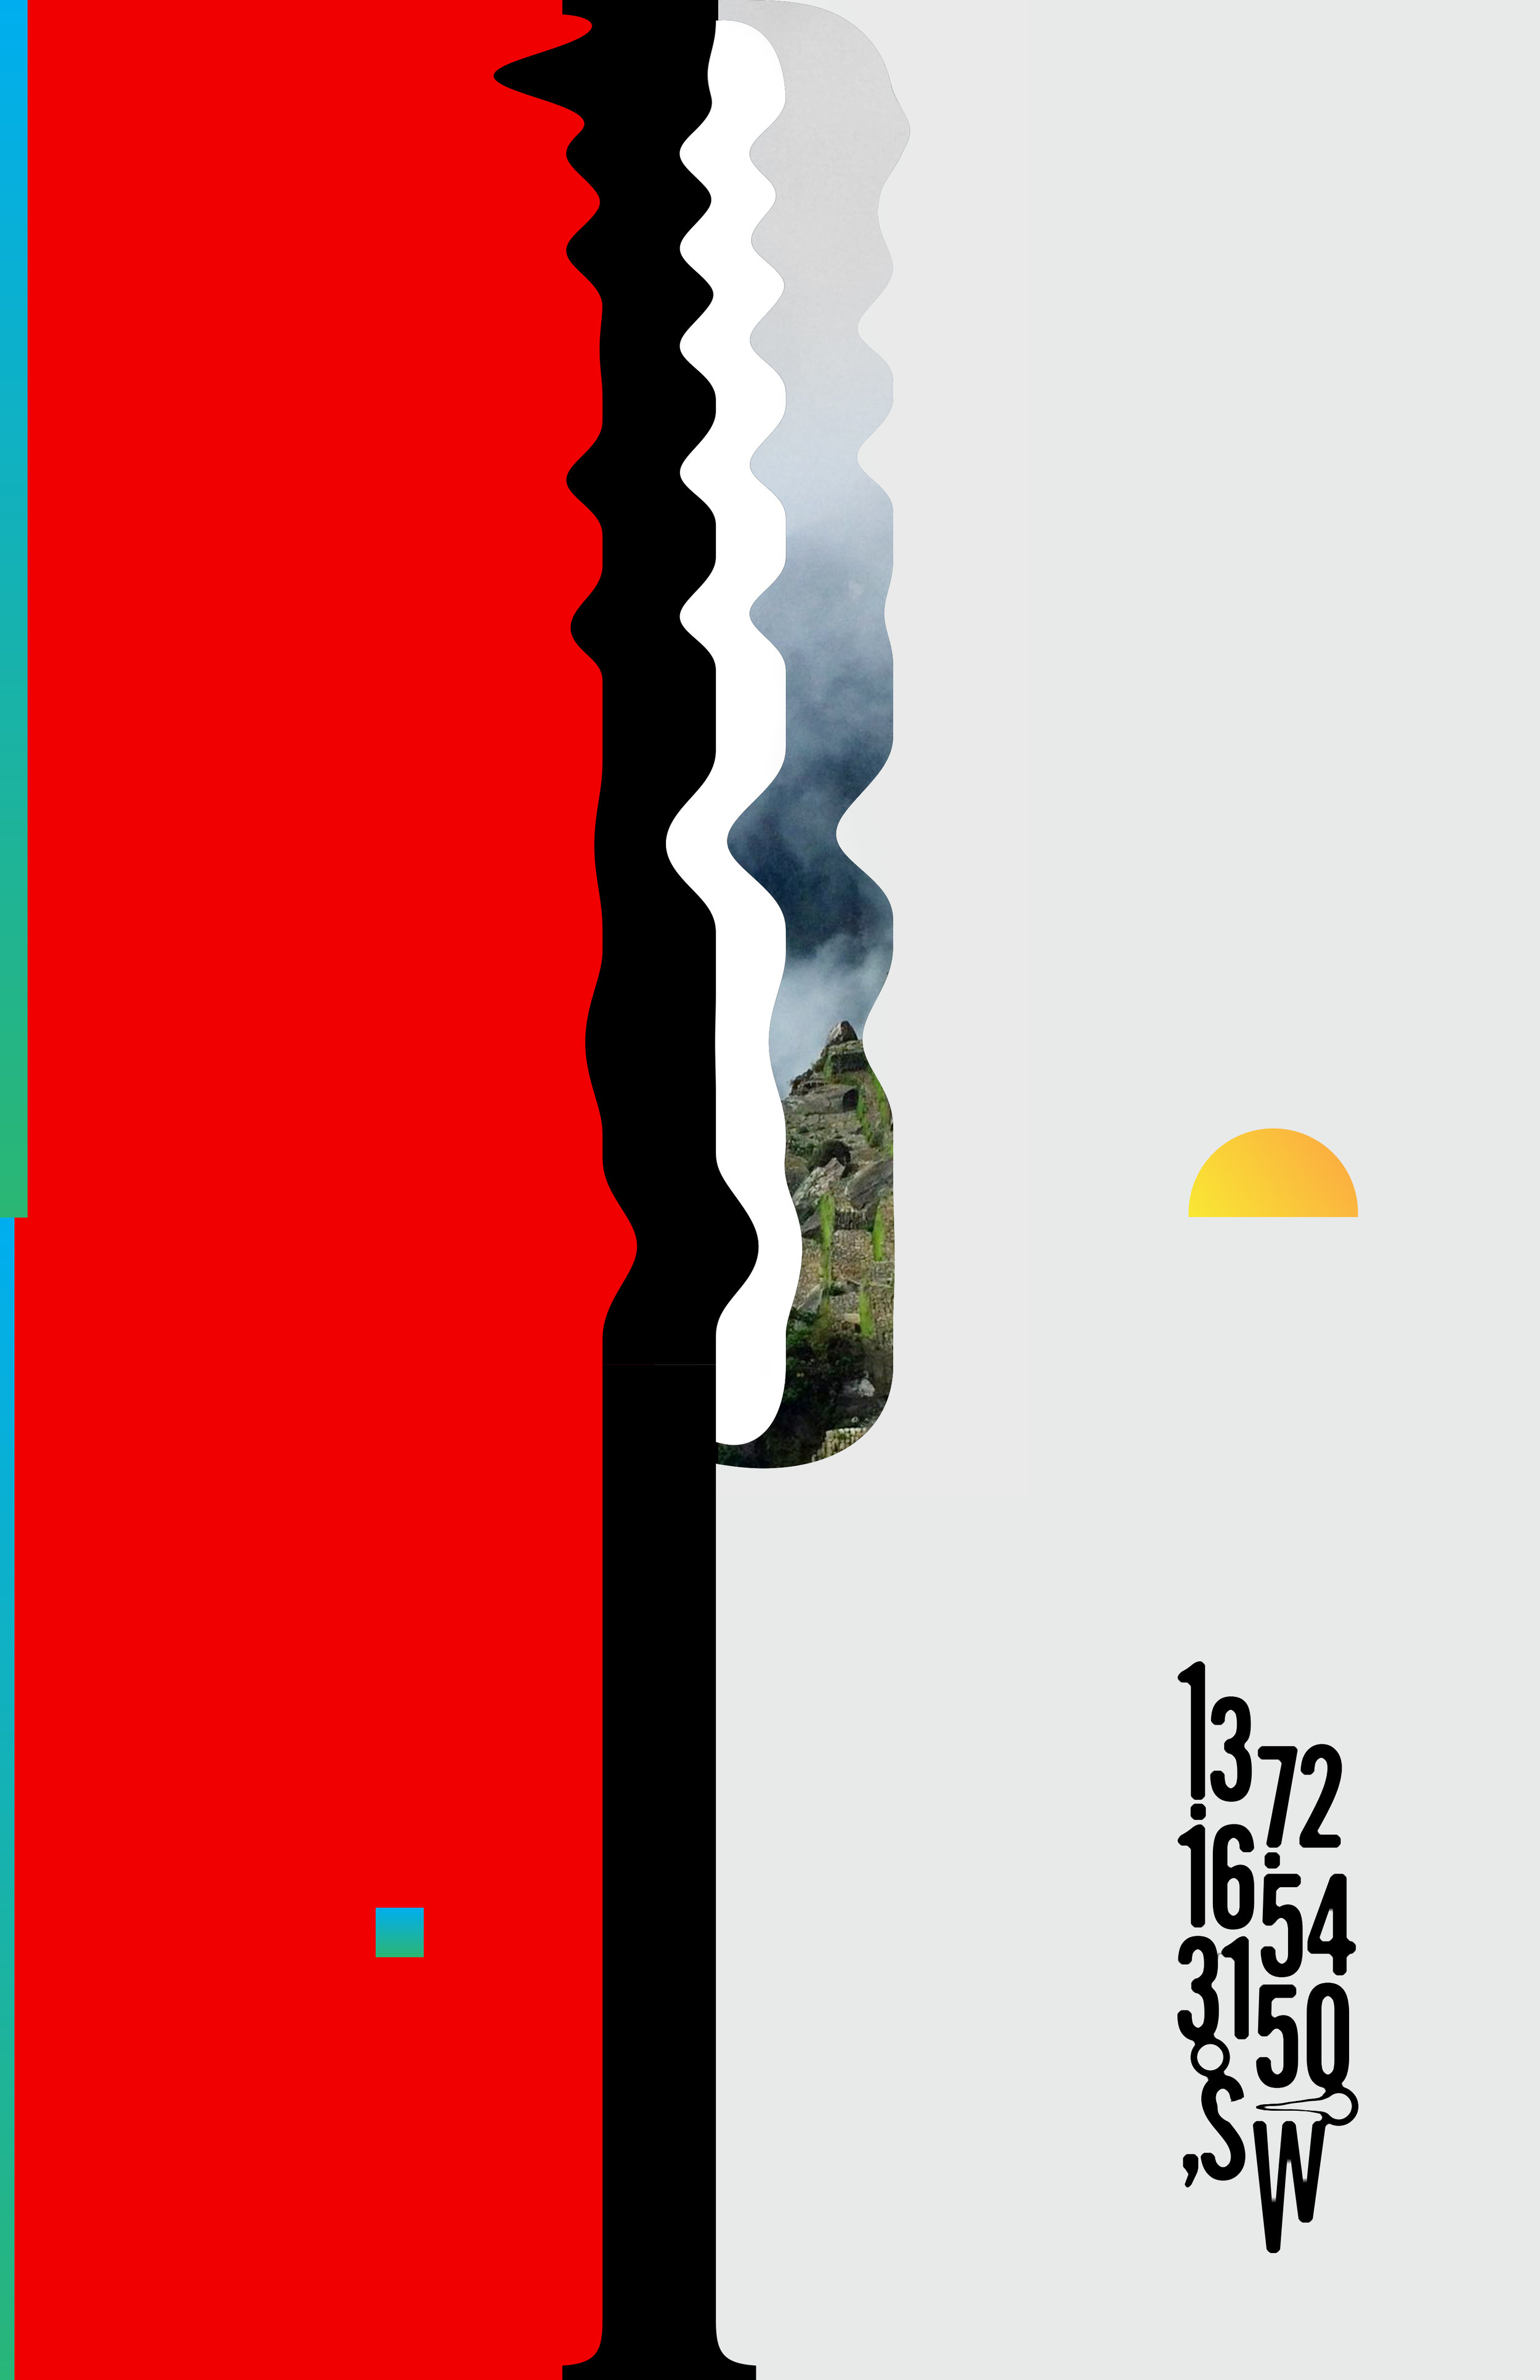 RTW_Peru_Poster.jpg